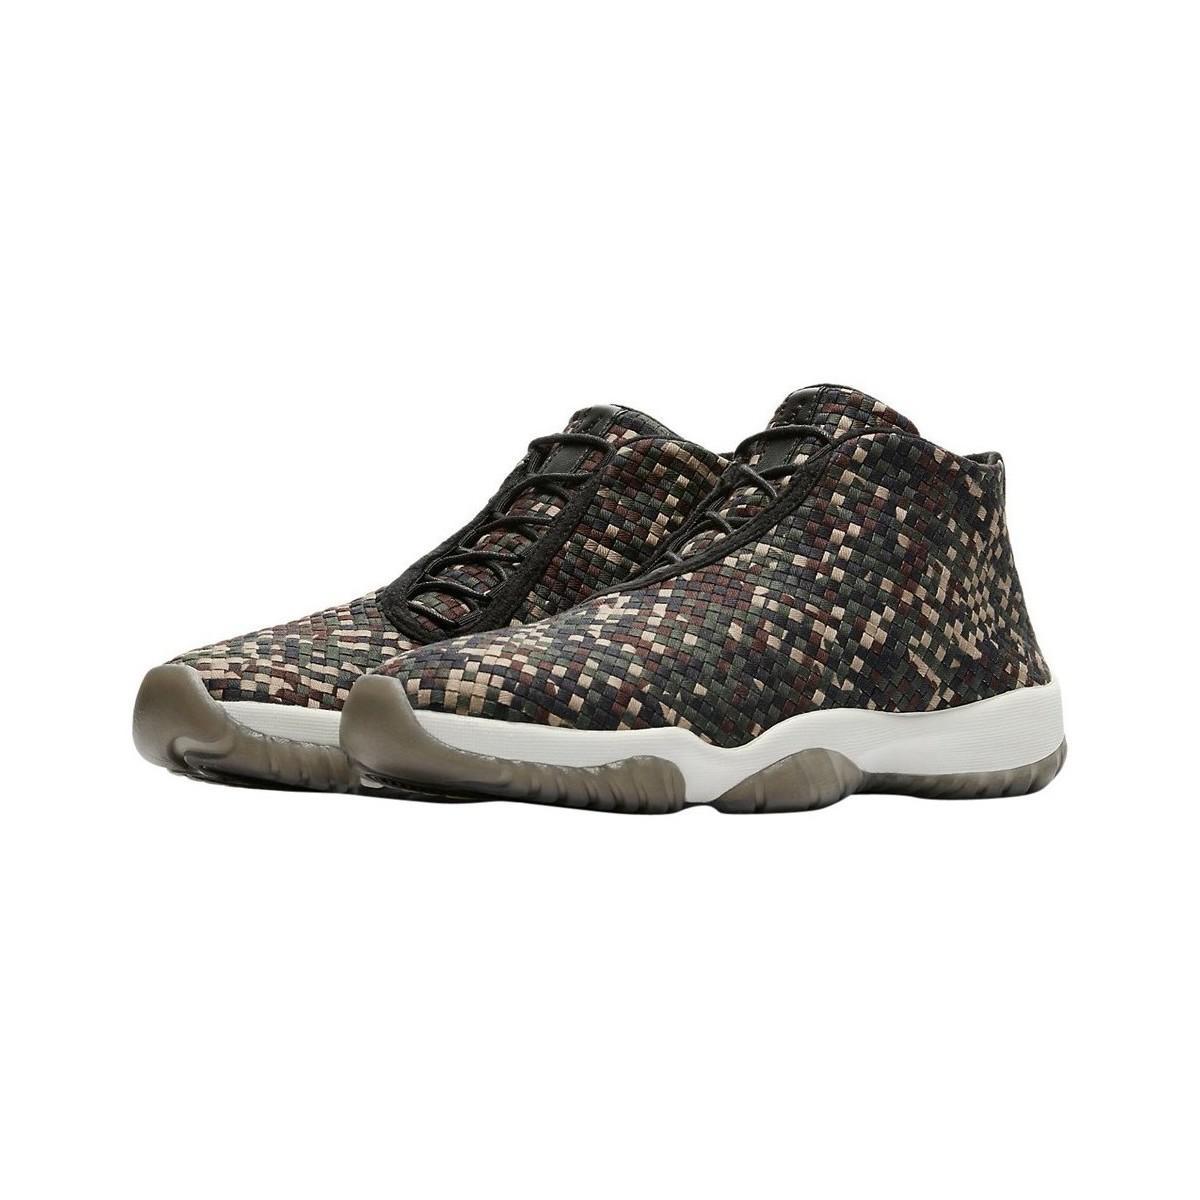 1a0e5f6b040982 Nike Air Jordan Future Premium Camo Men s Shoes (high-top Trainers ...